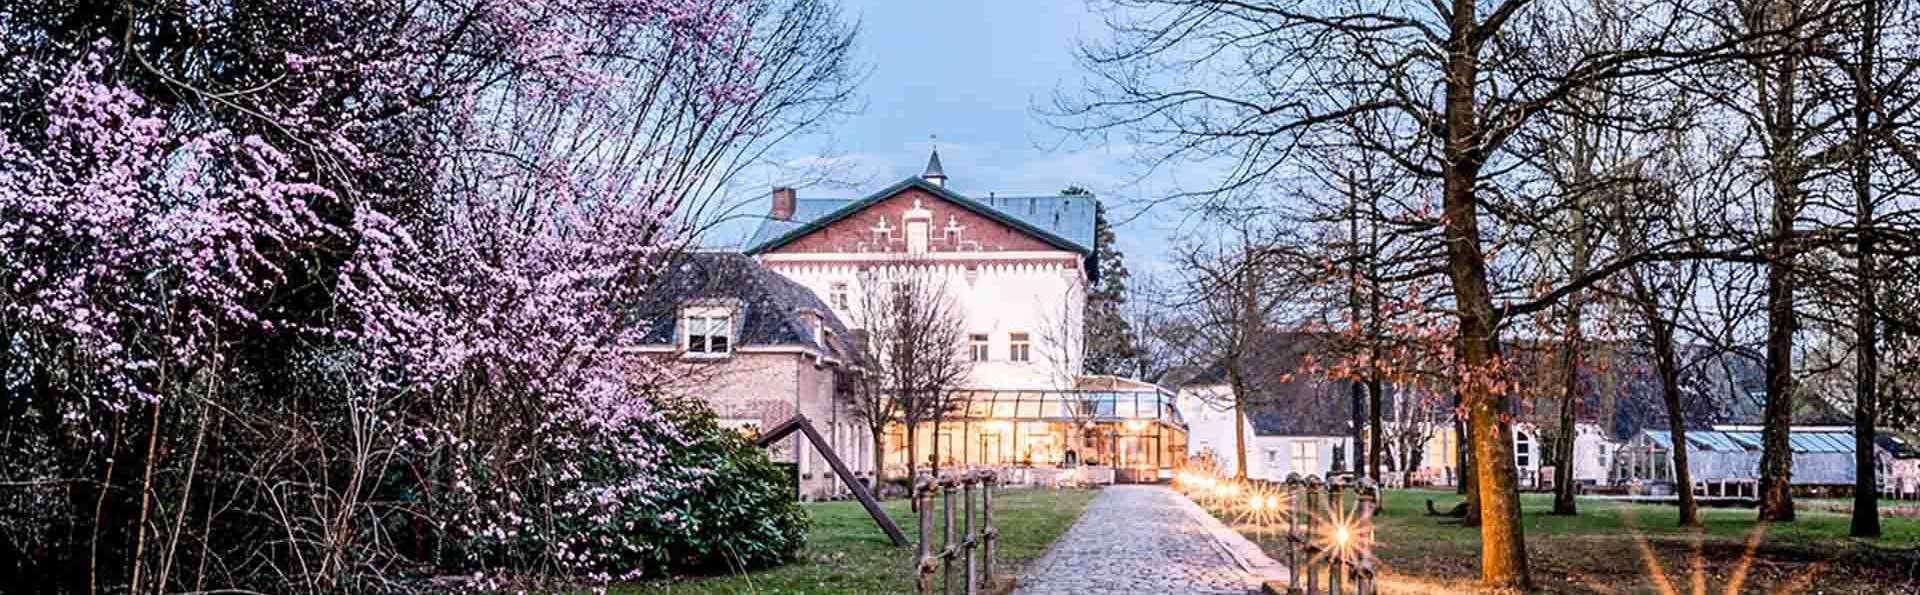 Pillows Charme Hotel Château de Raay Limburg  - EDIT_Pillows_Charme_Hotel_Chateau_De_Raay_Building_Evening_01.jpg